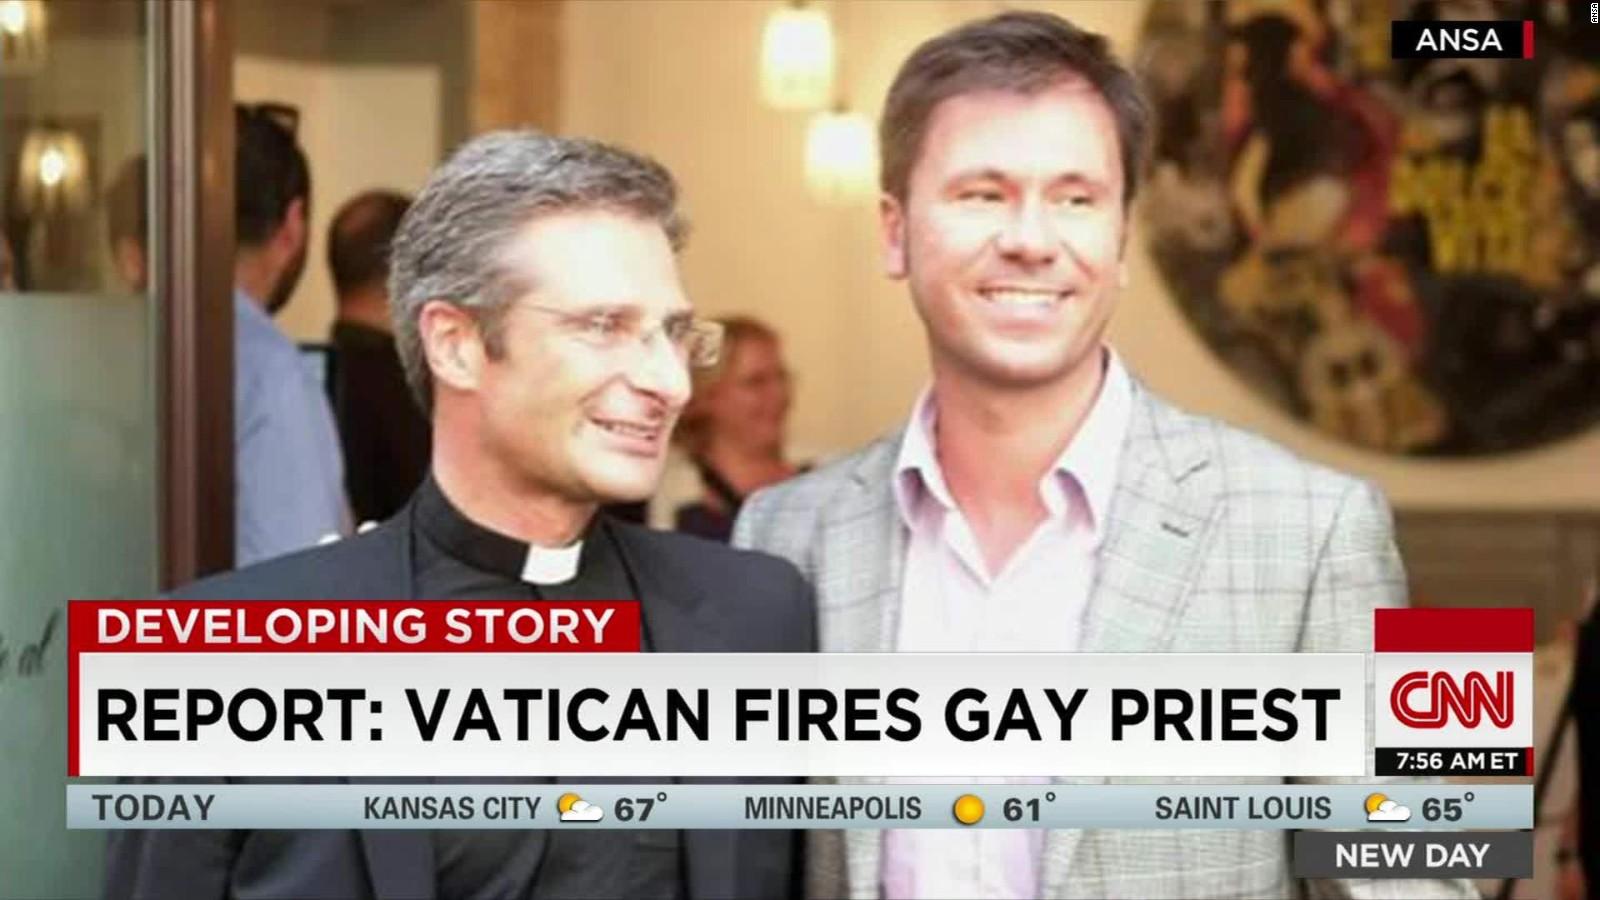 Agree, vatican homosexual scandal words